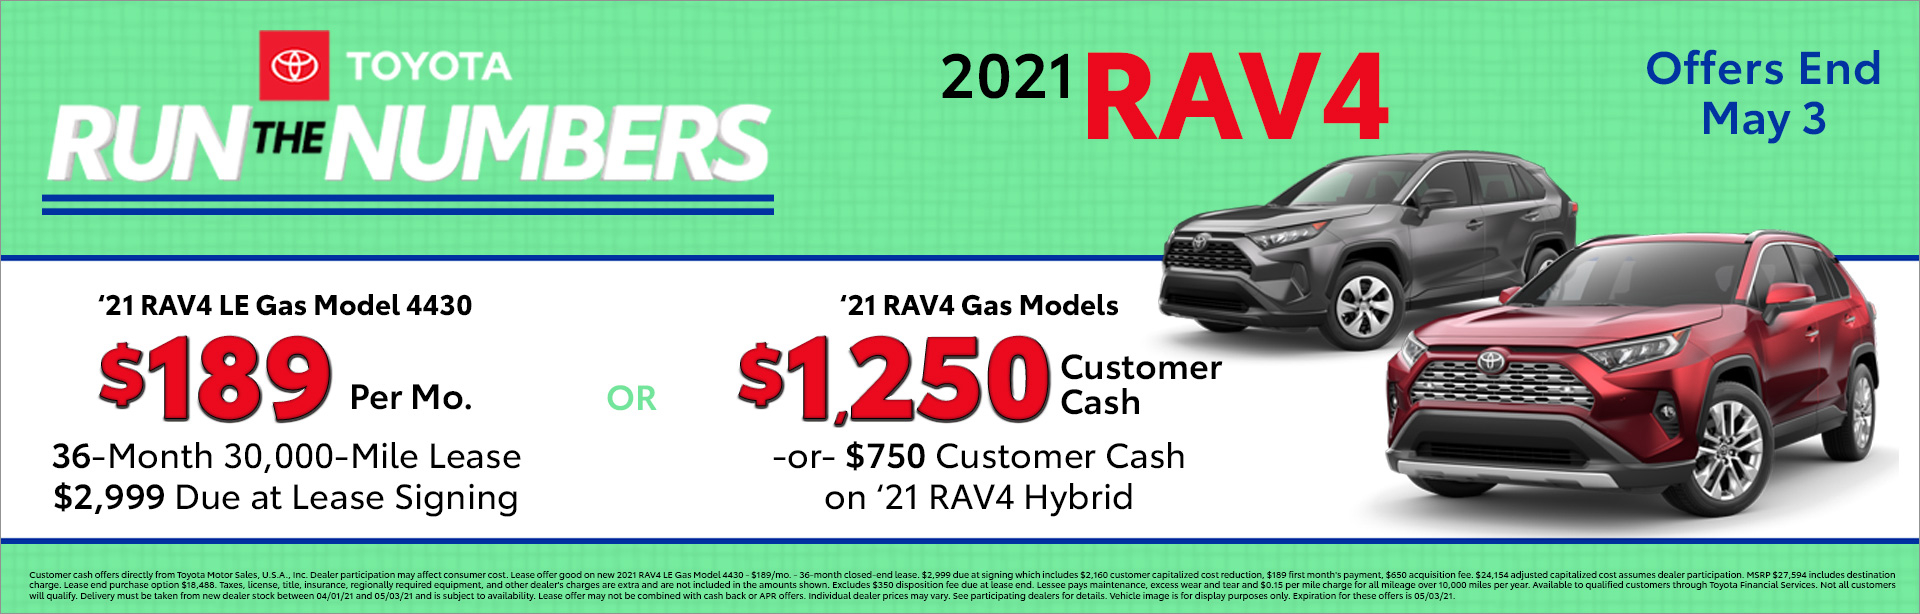 04-21_01_Cincinnati-April-2021-CIN-Run-the-numbers-RAV-4_1920x614_7dcb_RAV4-RAV4-Hybrid_O_xta.jpeg